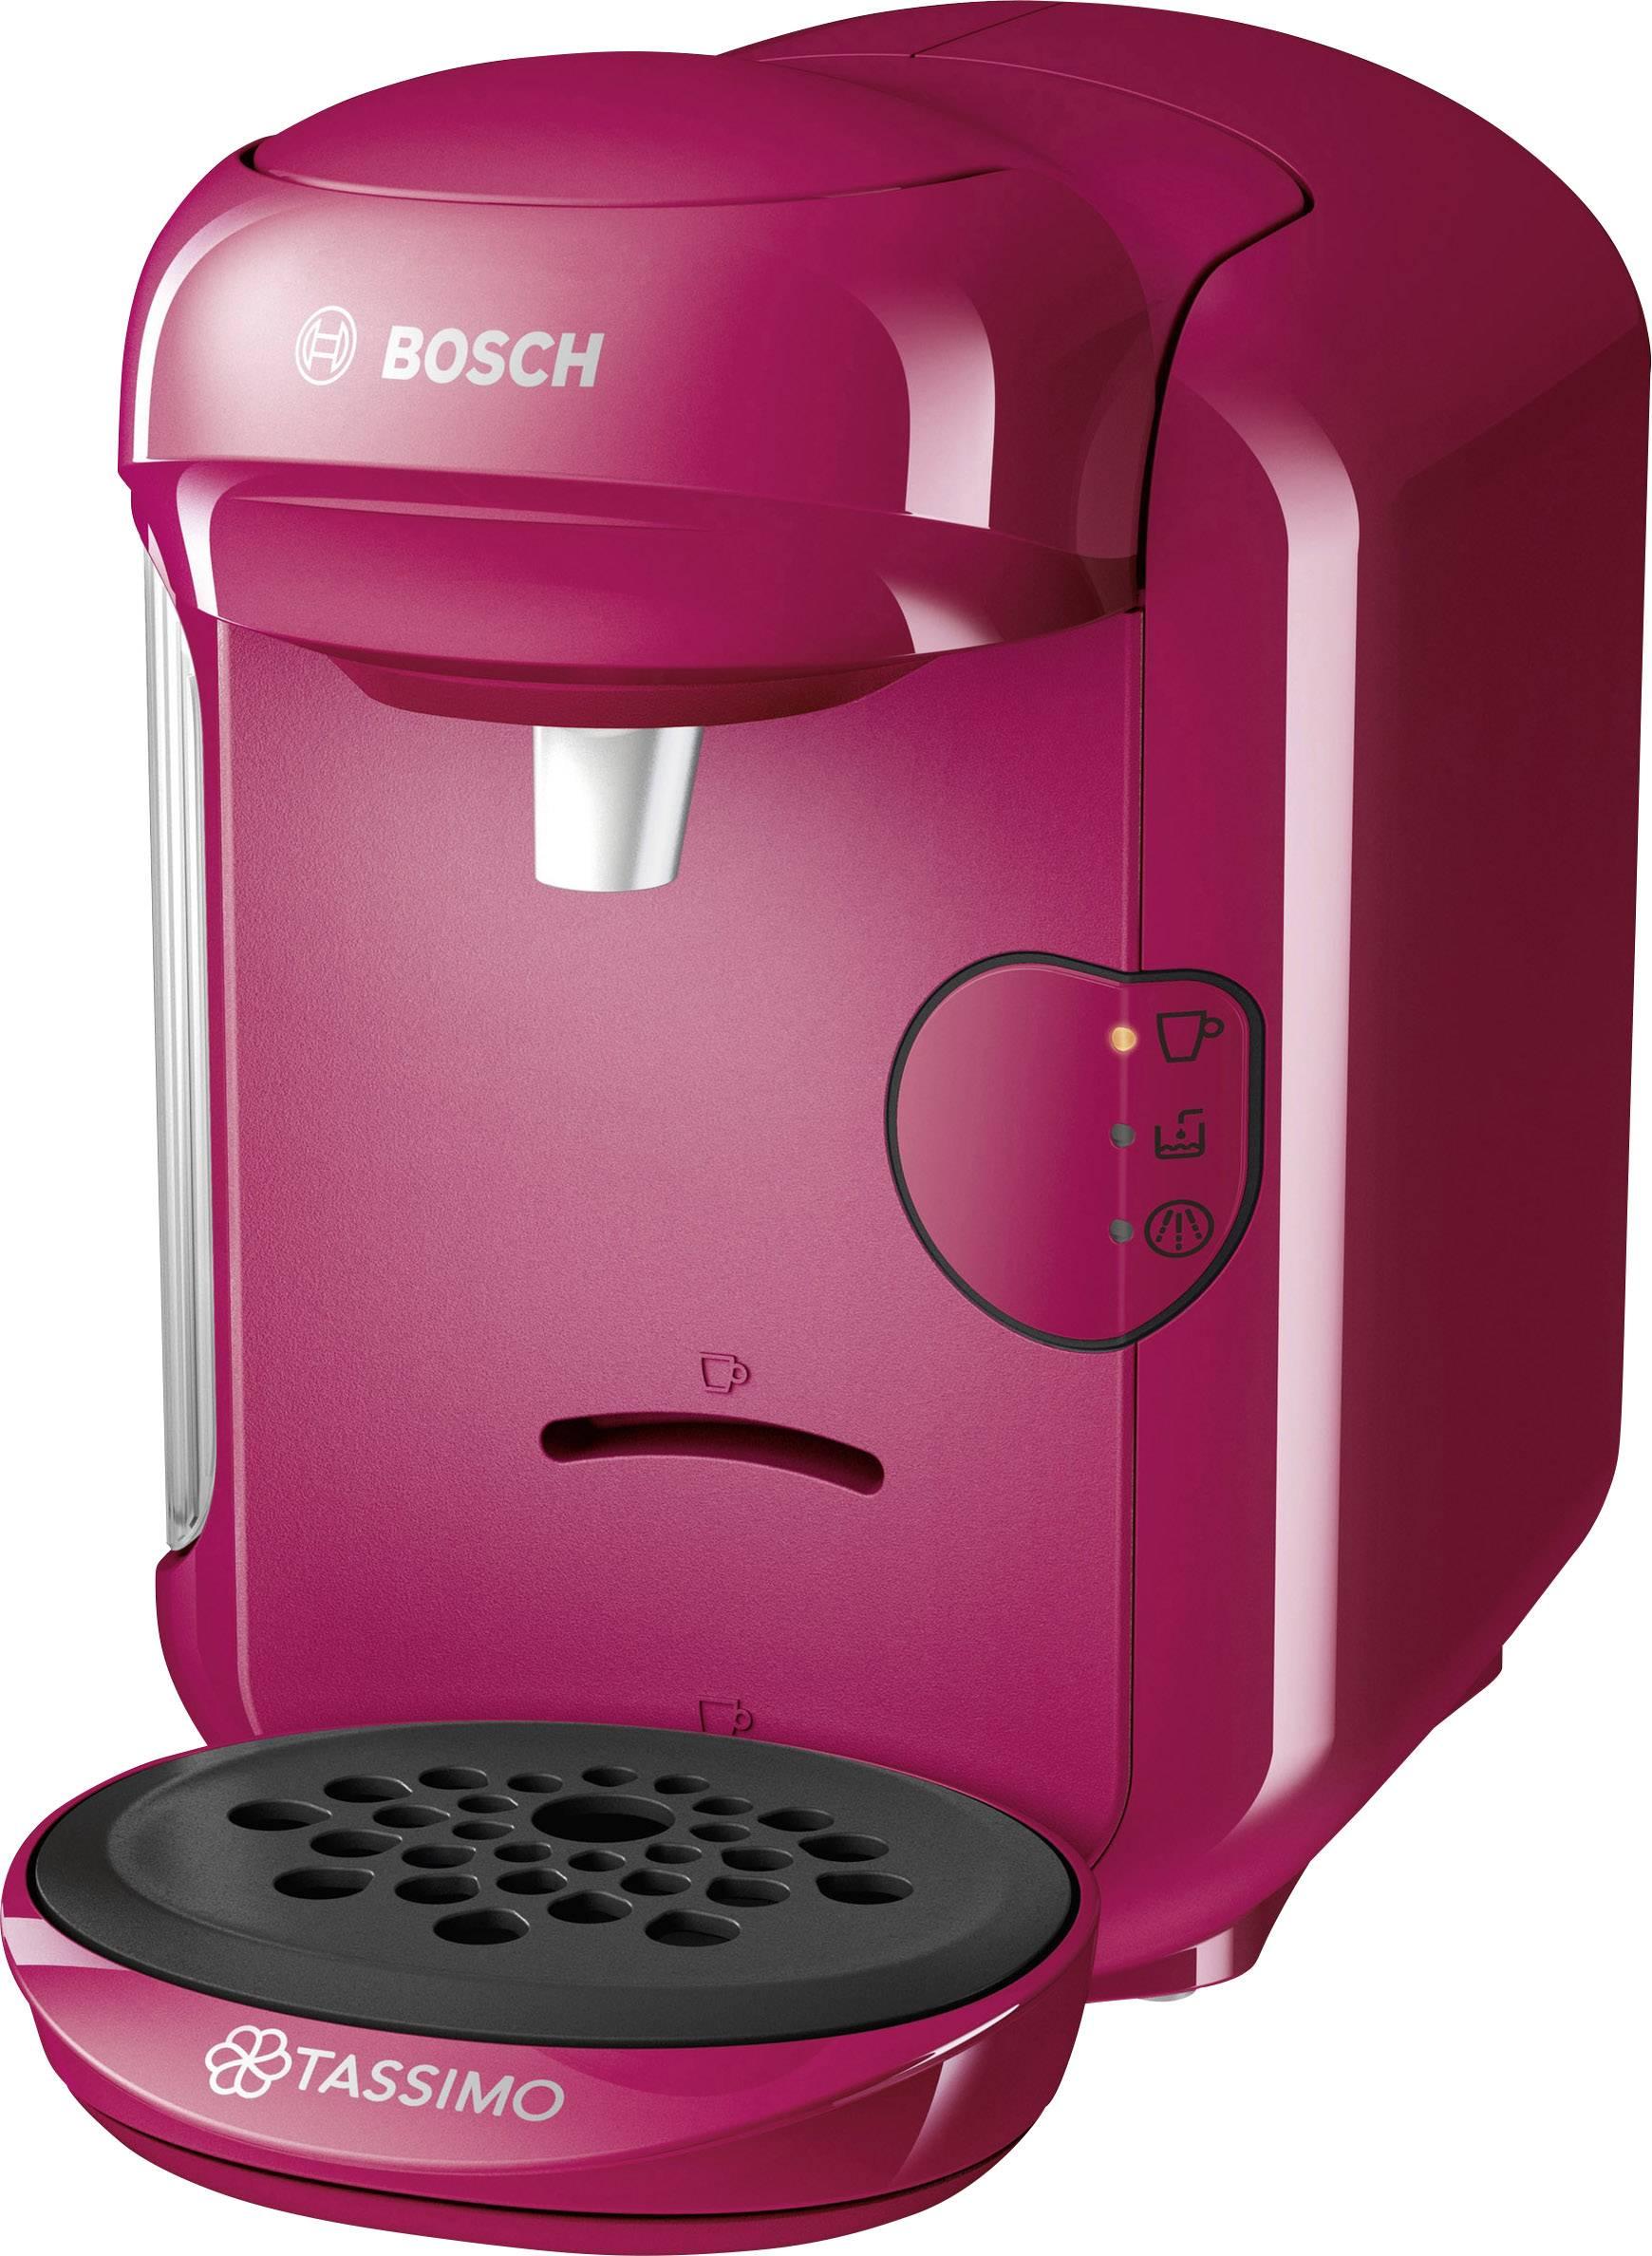 Bosch Haushalt Tassimo VIVY 2 TAS1401 kavni avtomat na kapsule roza one touch